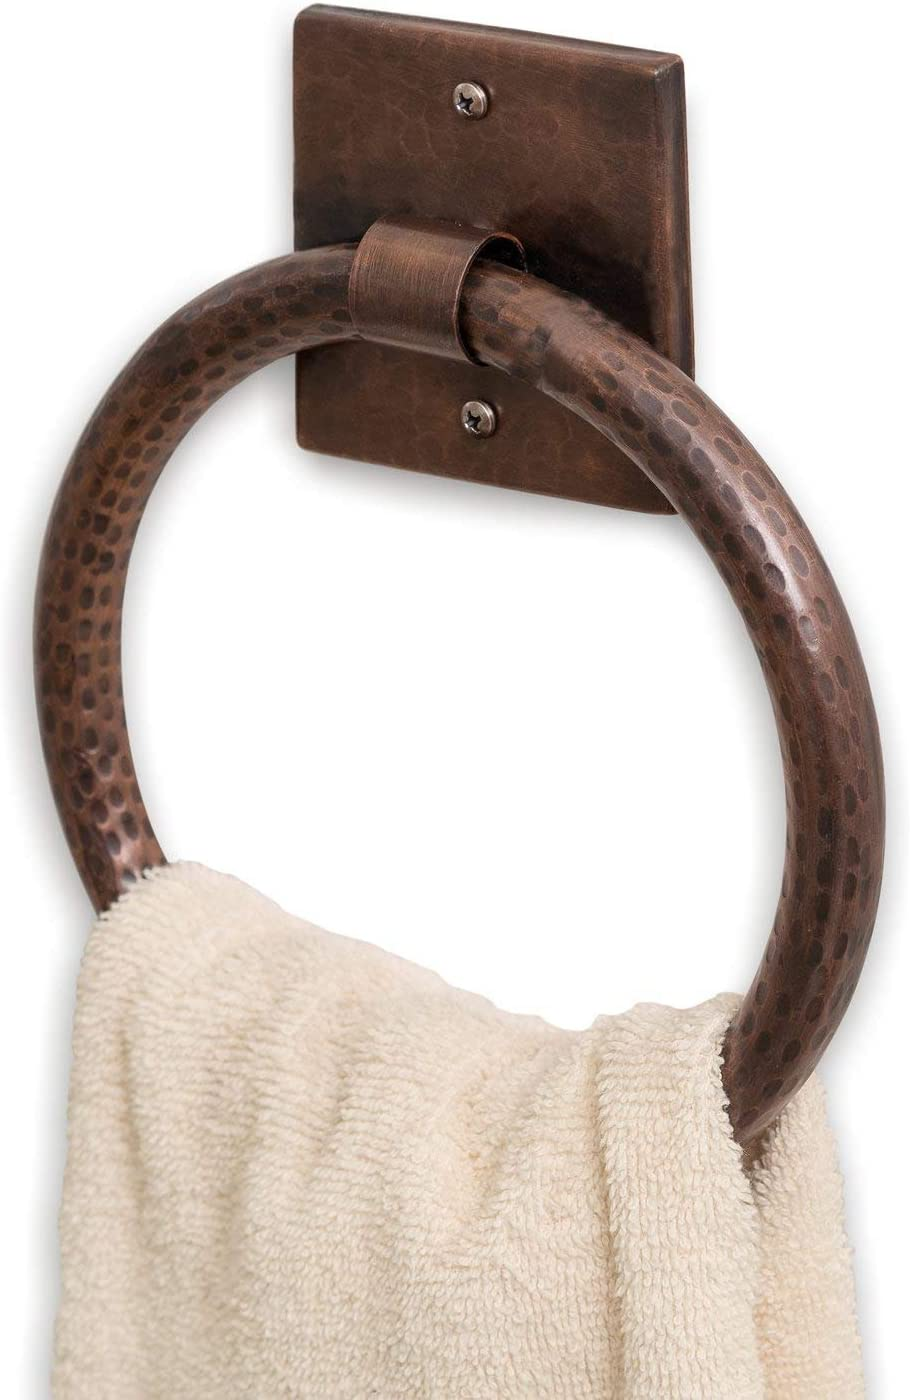 Monarch Abode 18006 Hand Hammered Towel Ring Satin Nickel